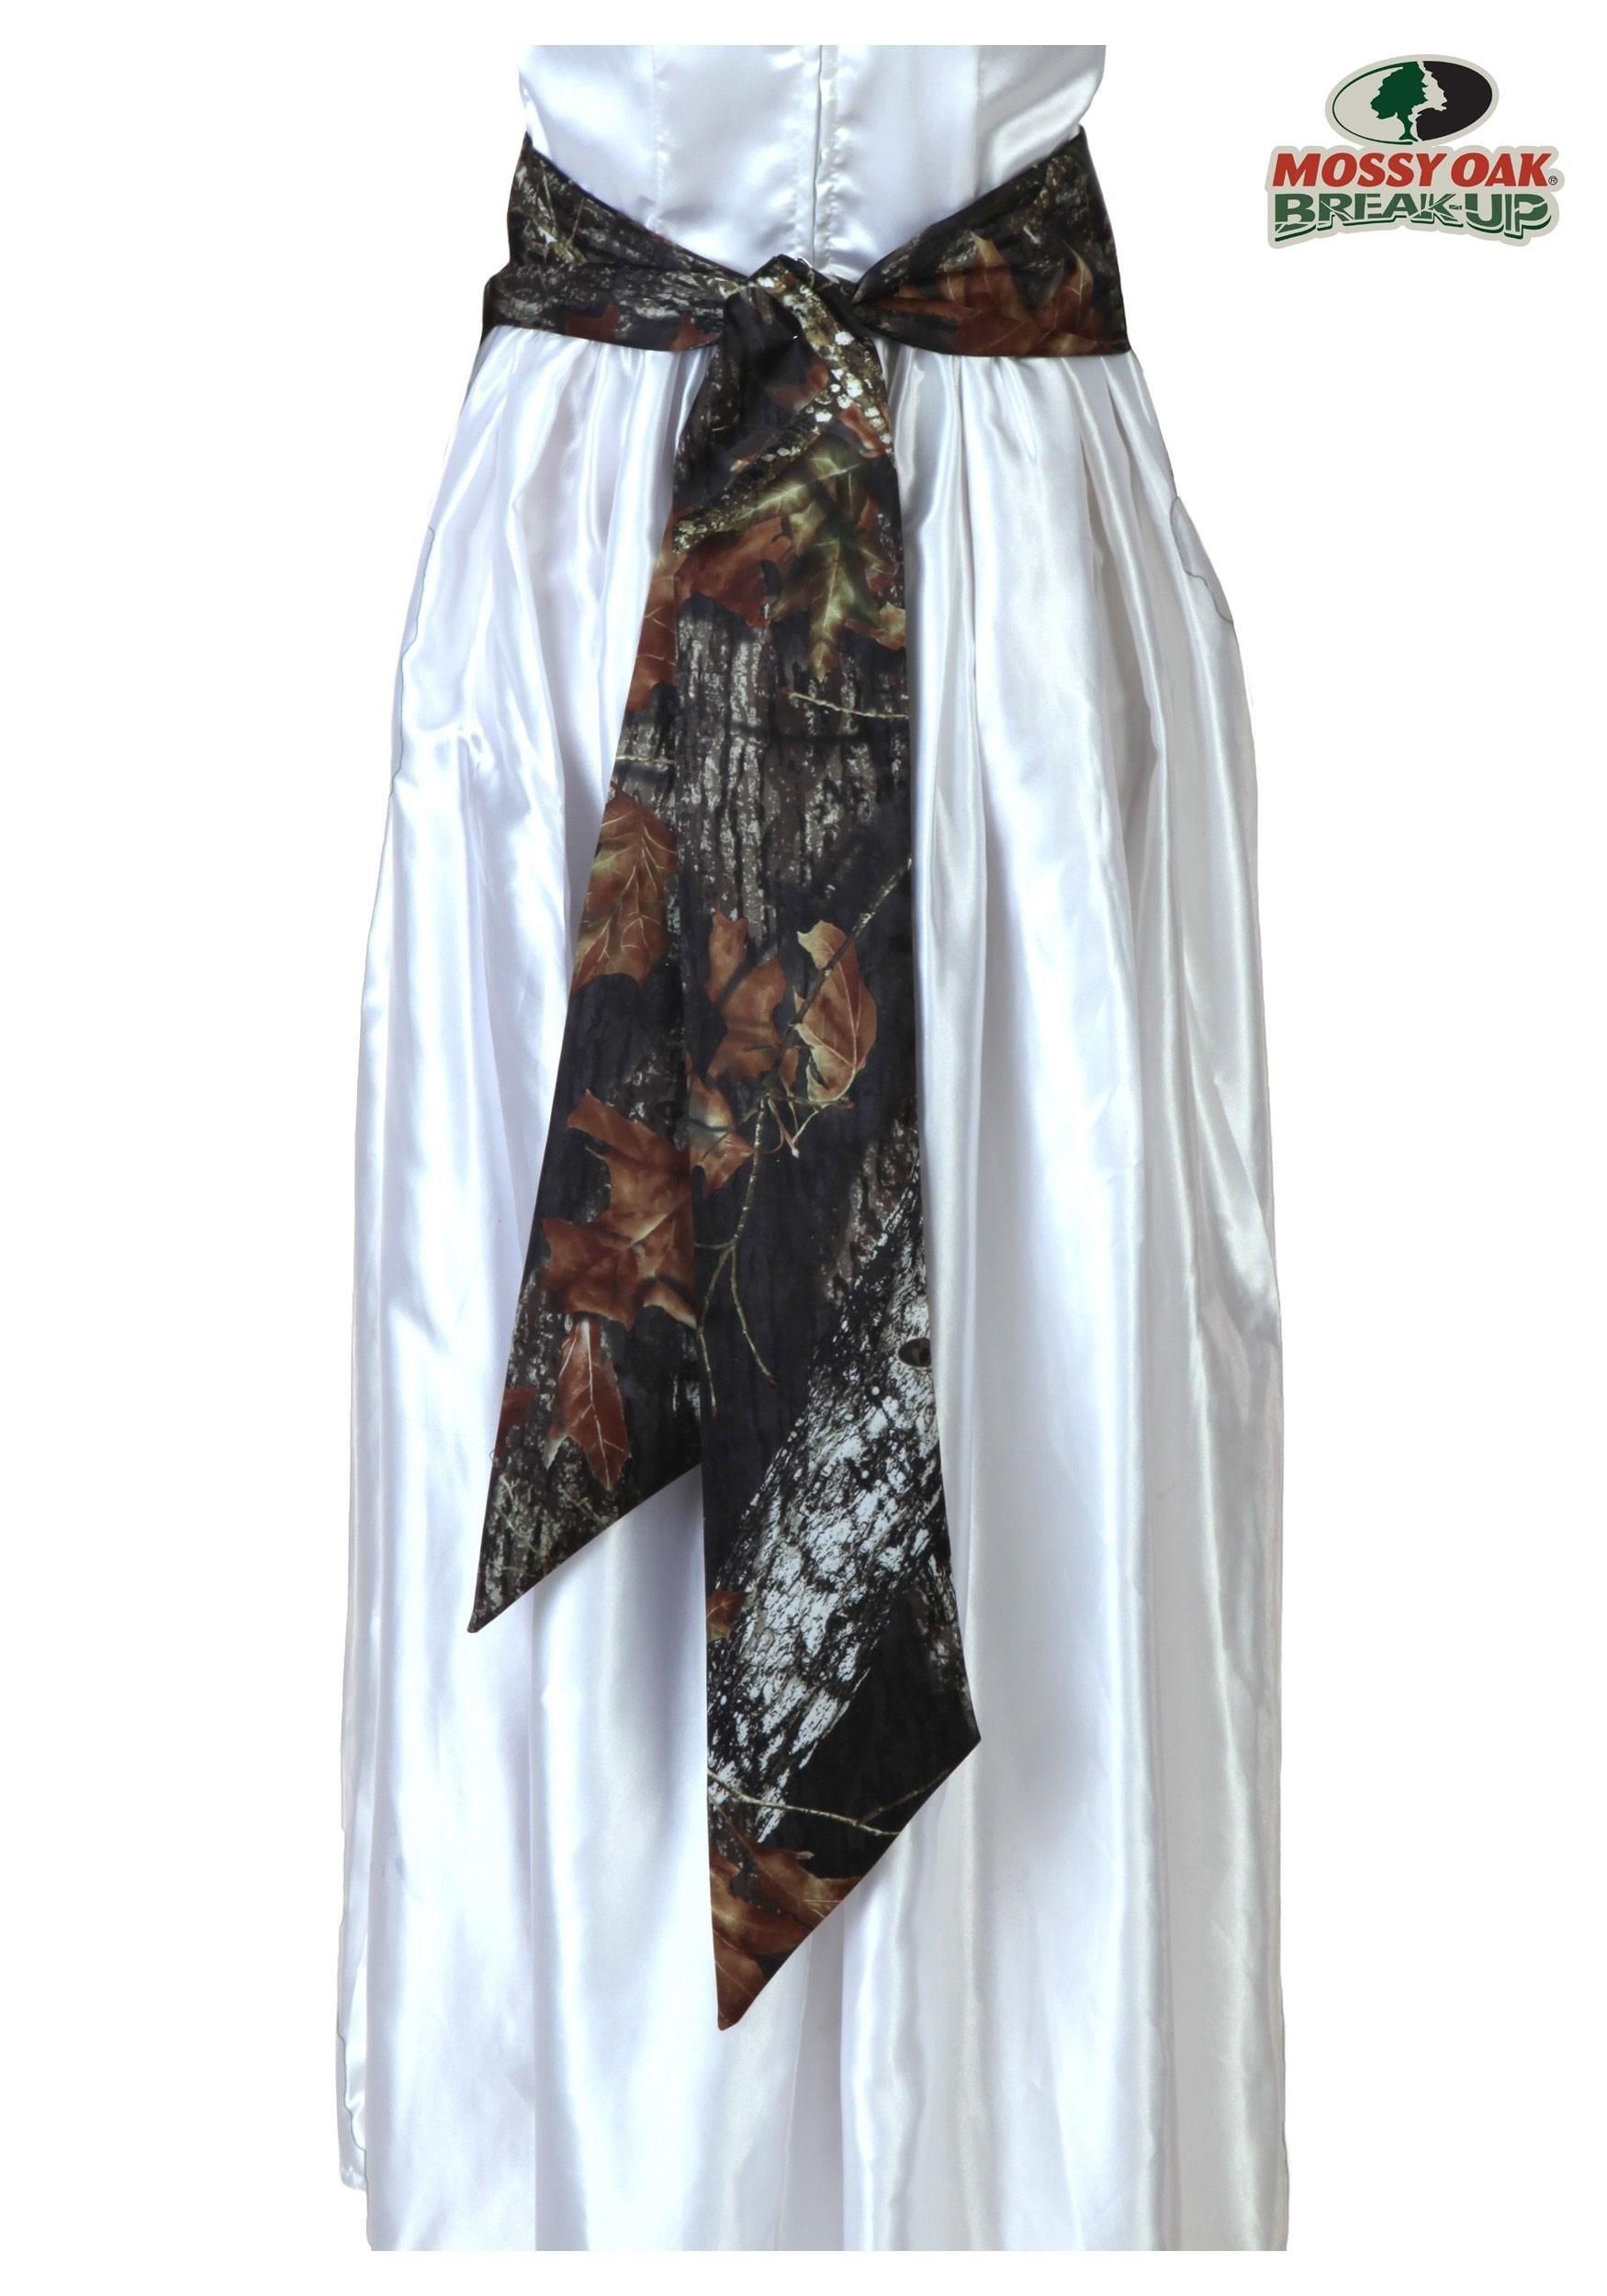 Mossy oak bridal sash for Mossy oak camo wedding dress